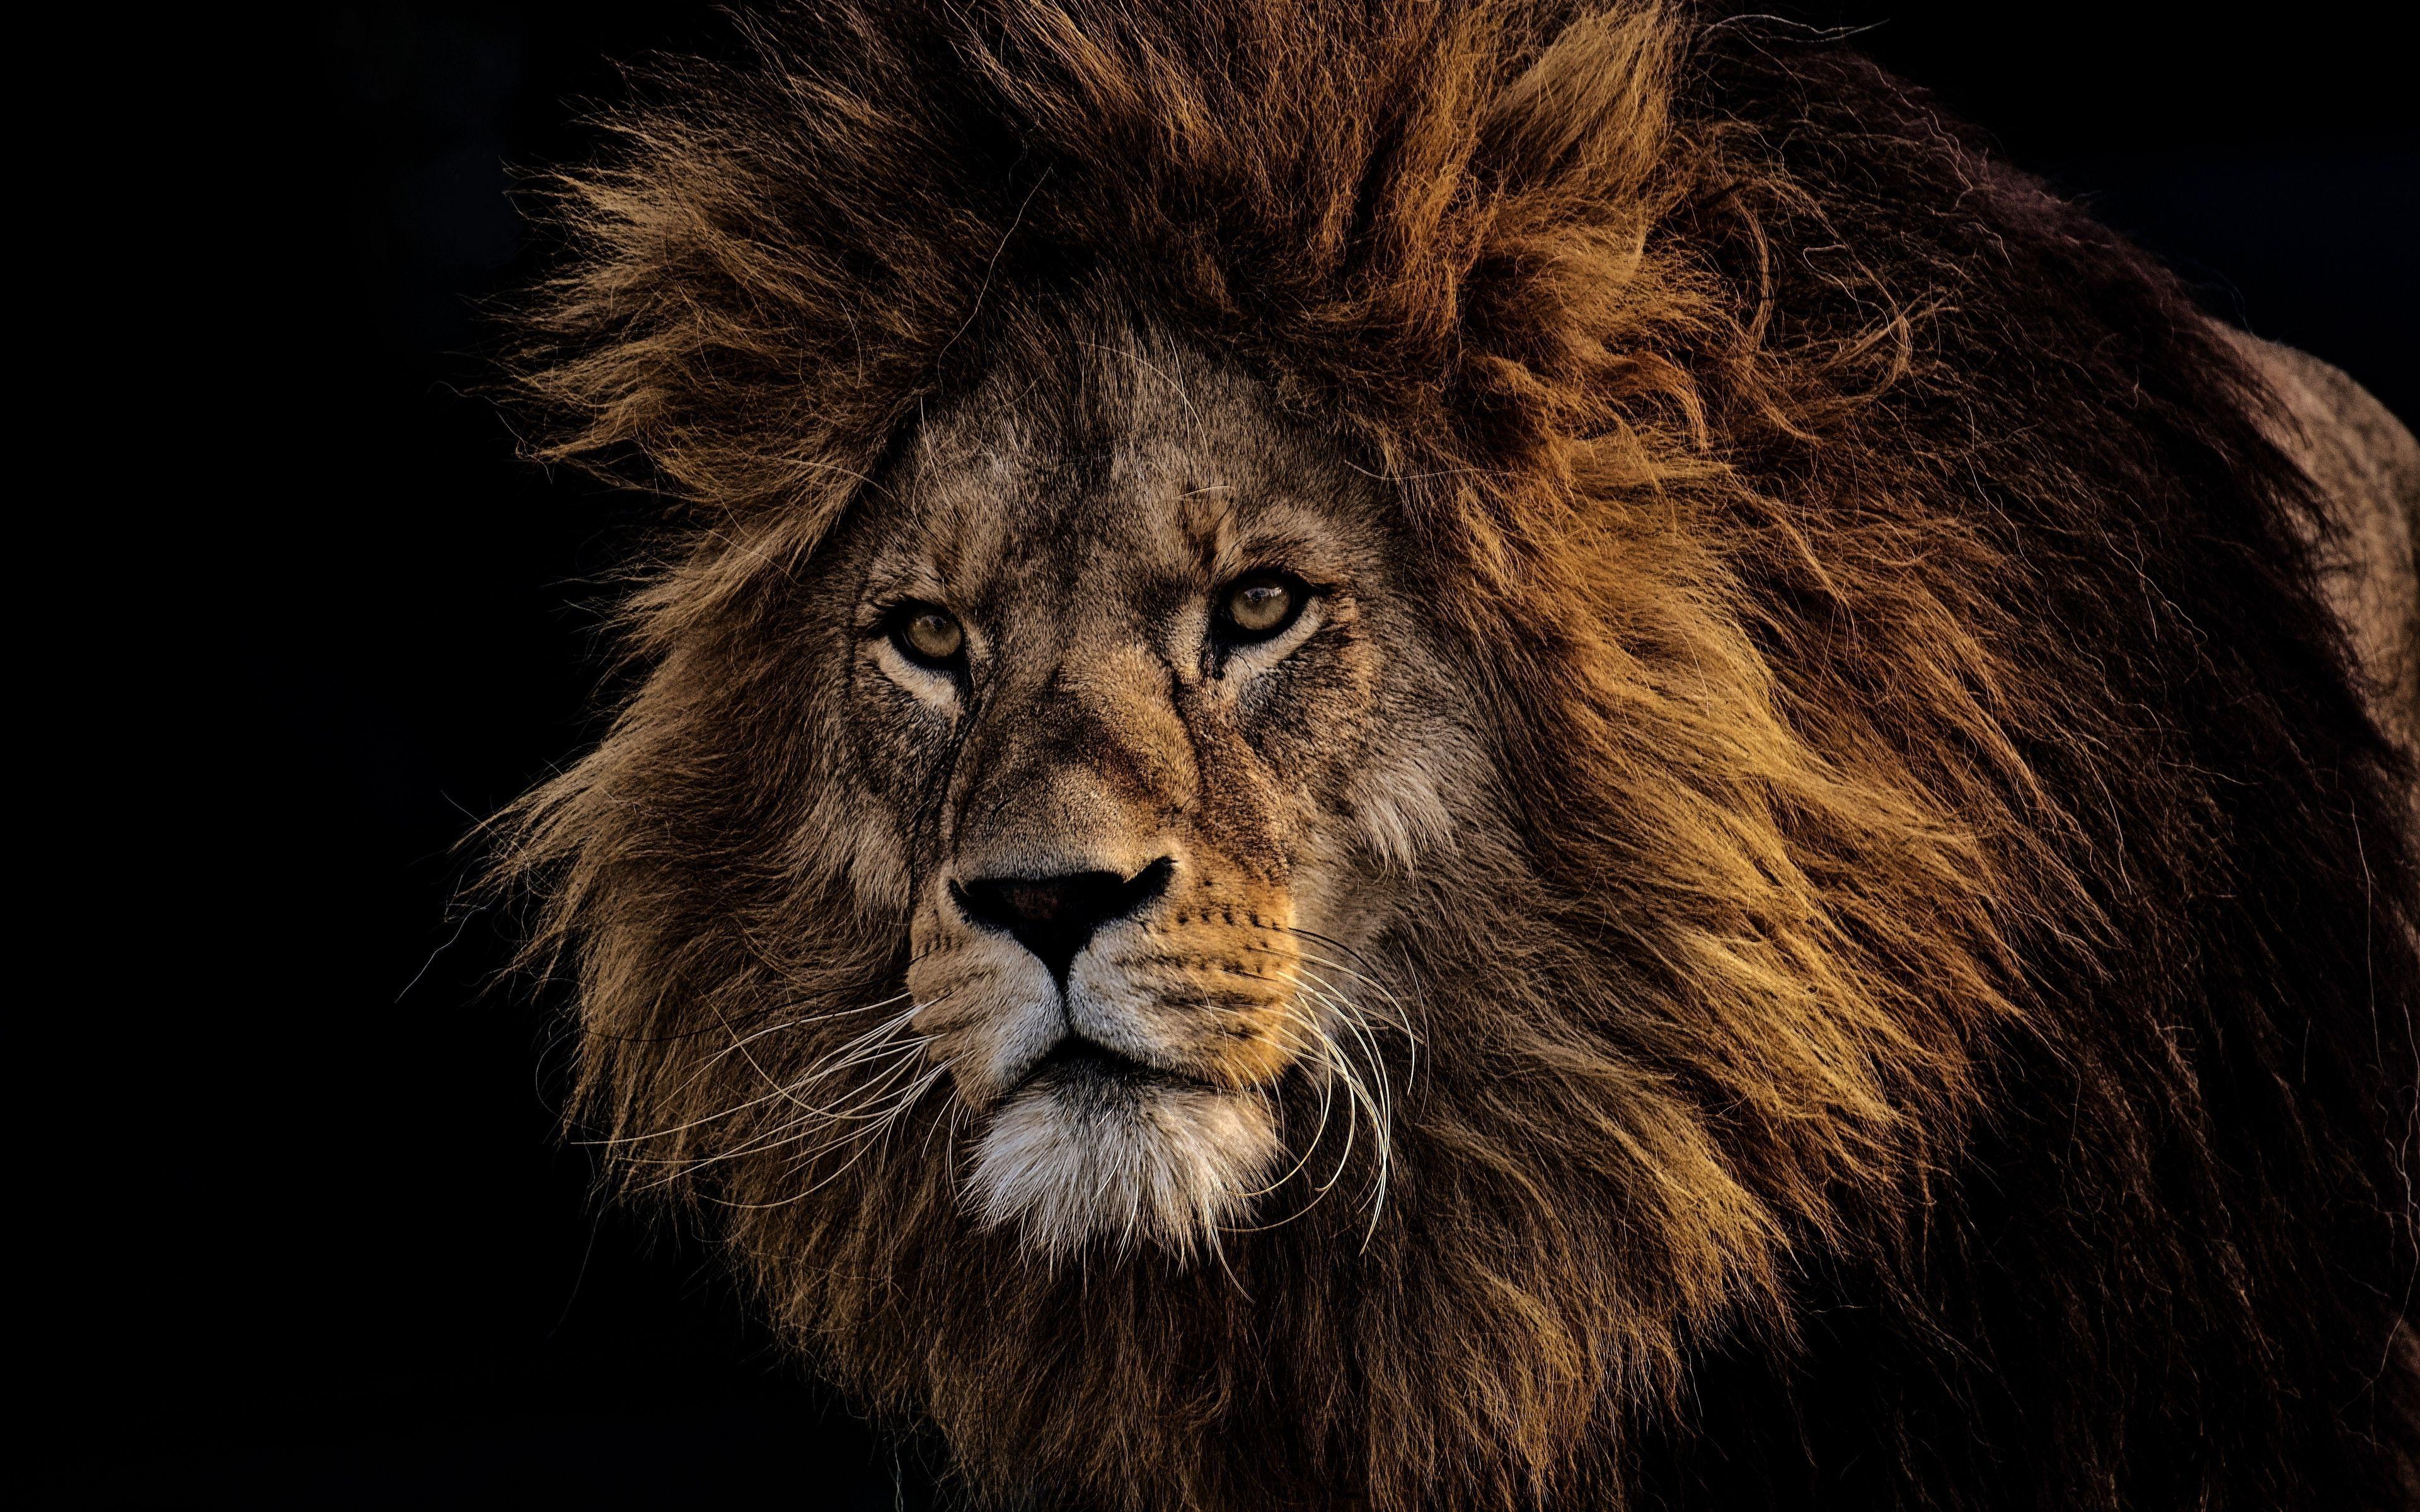 4k Ultra Hd Lion Wallpapers Top Free 4k Ultra Hd Lion Backgrounds Wallpaperaccess